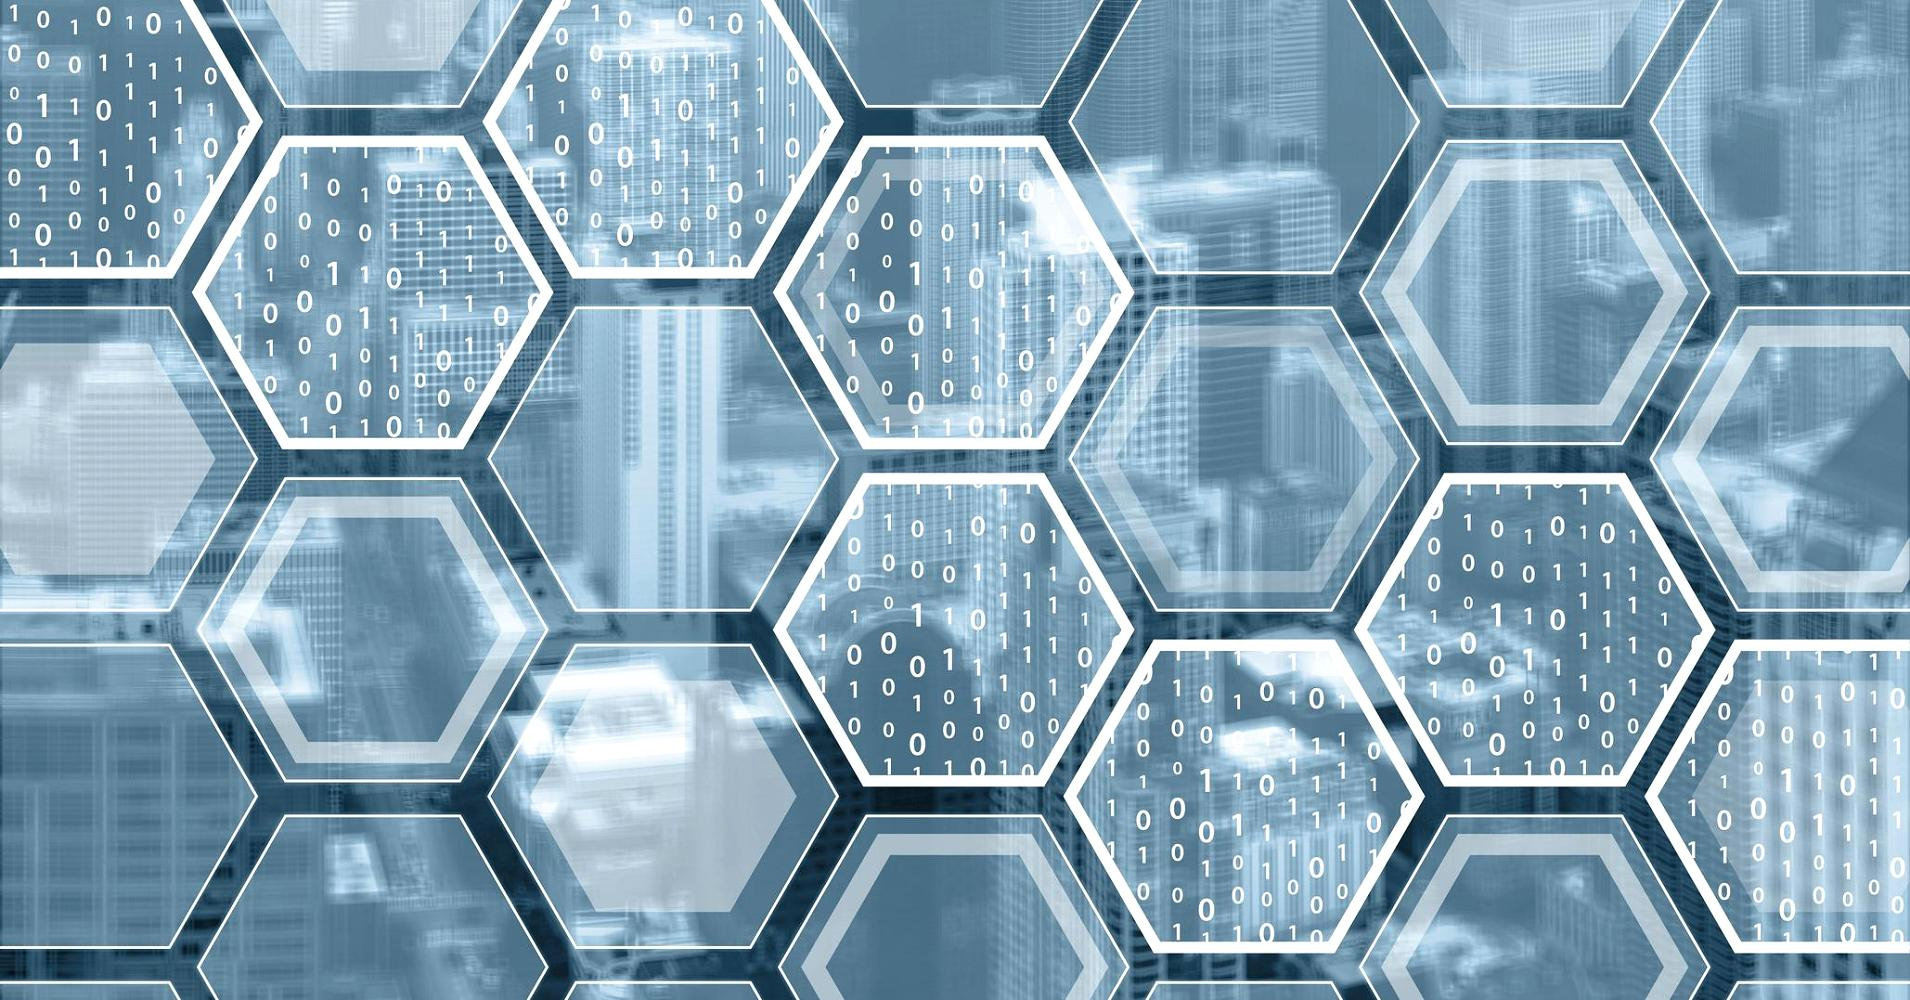 Image of digital honeycomb